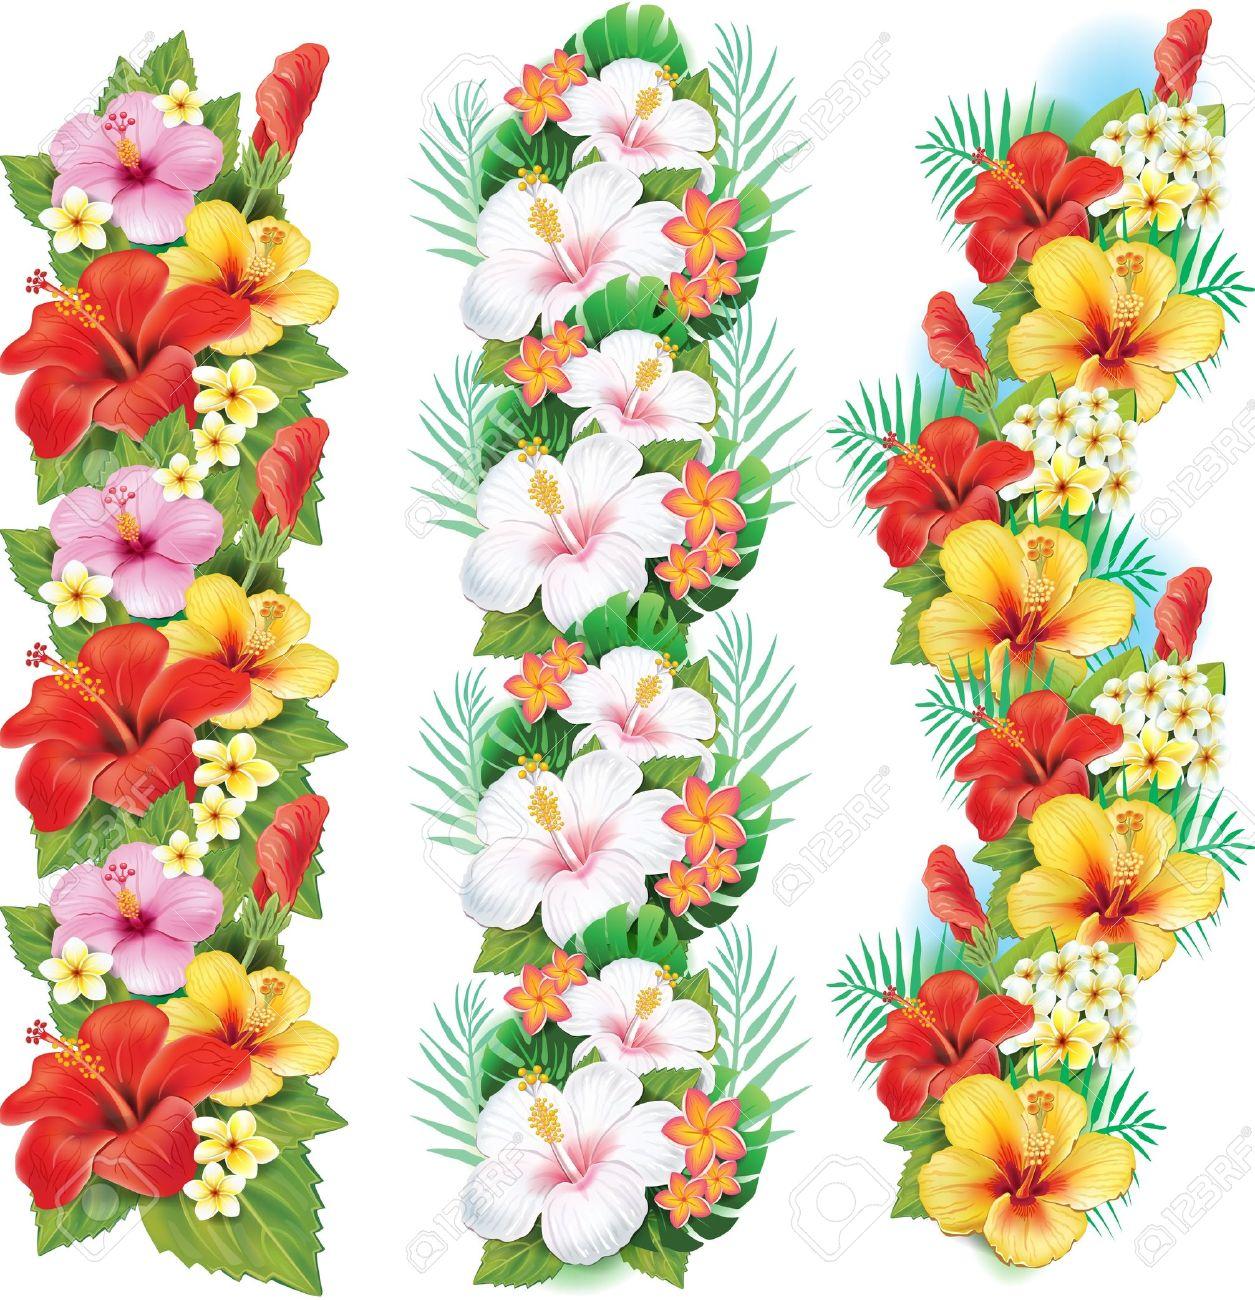 Garland of hibiscus flowers - 21670795